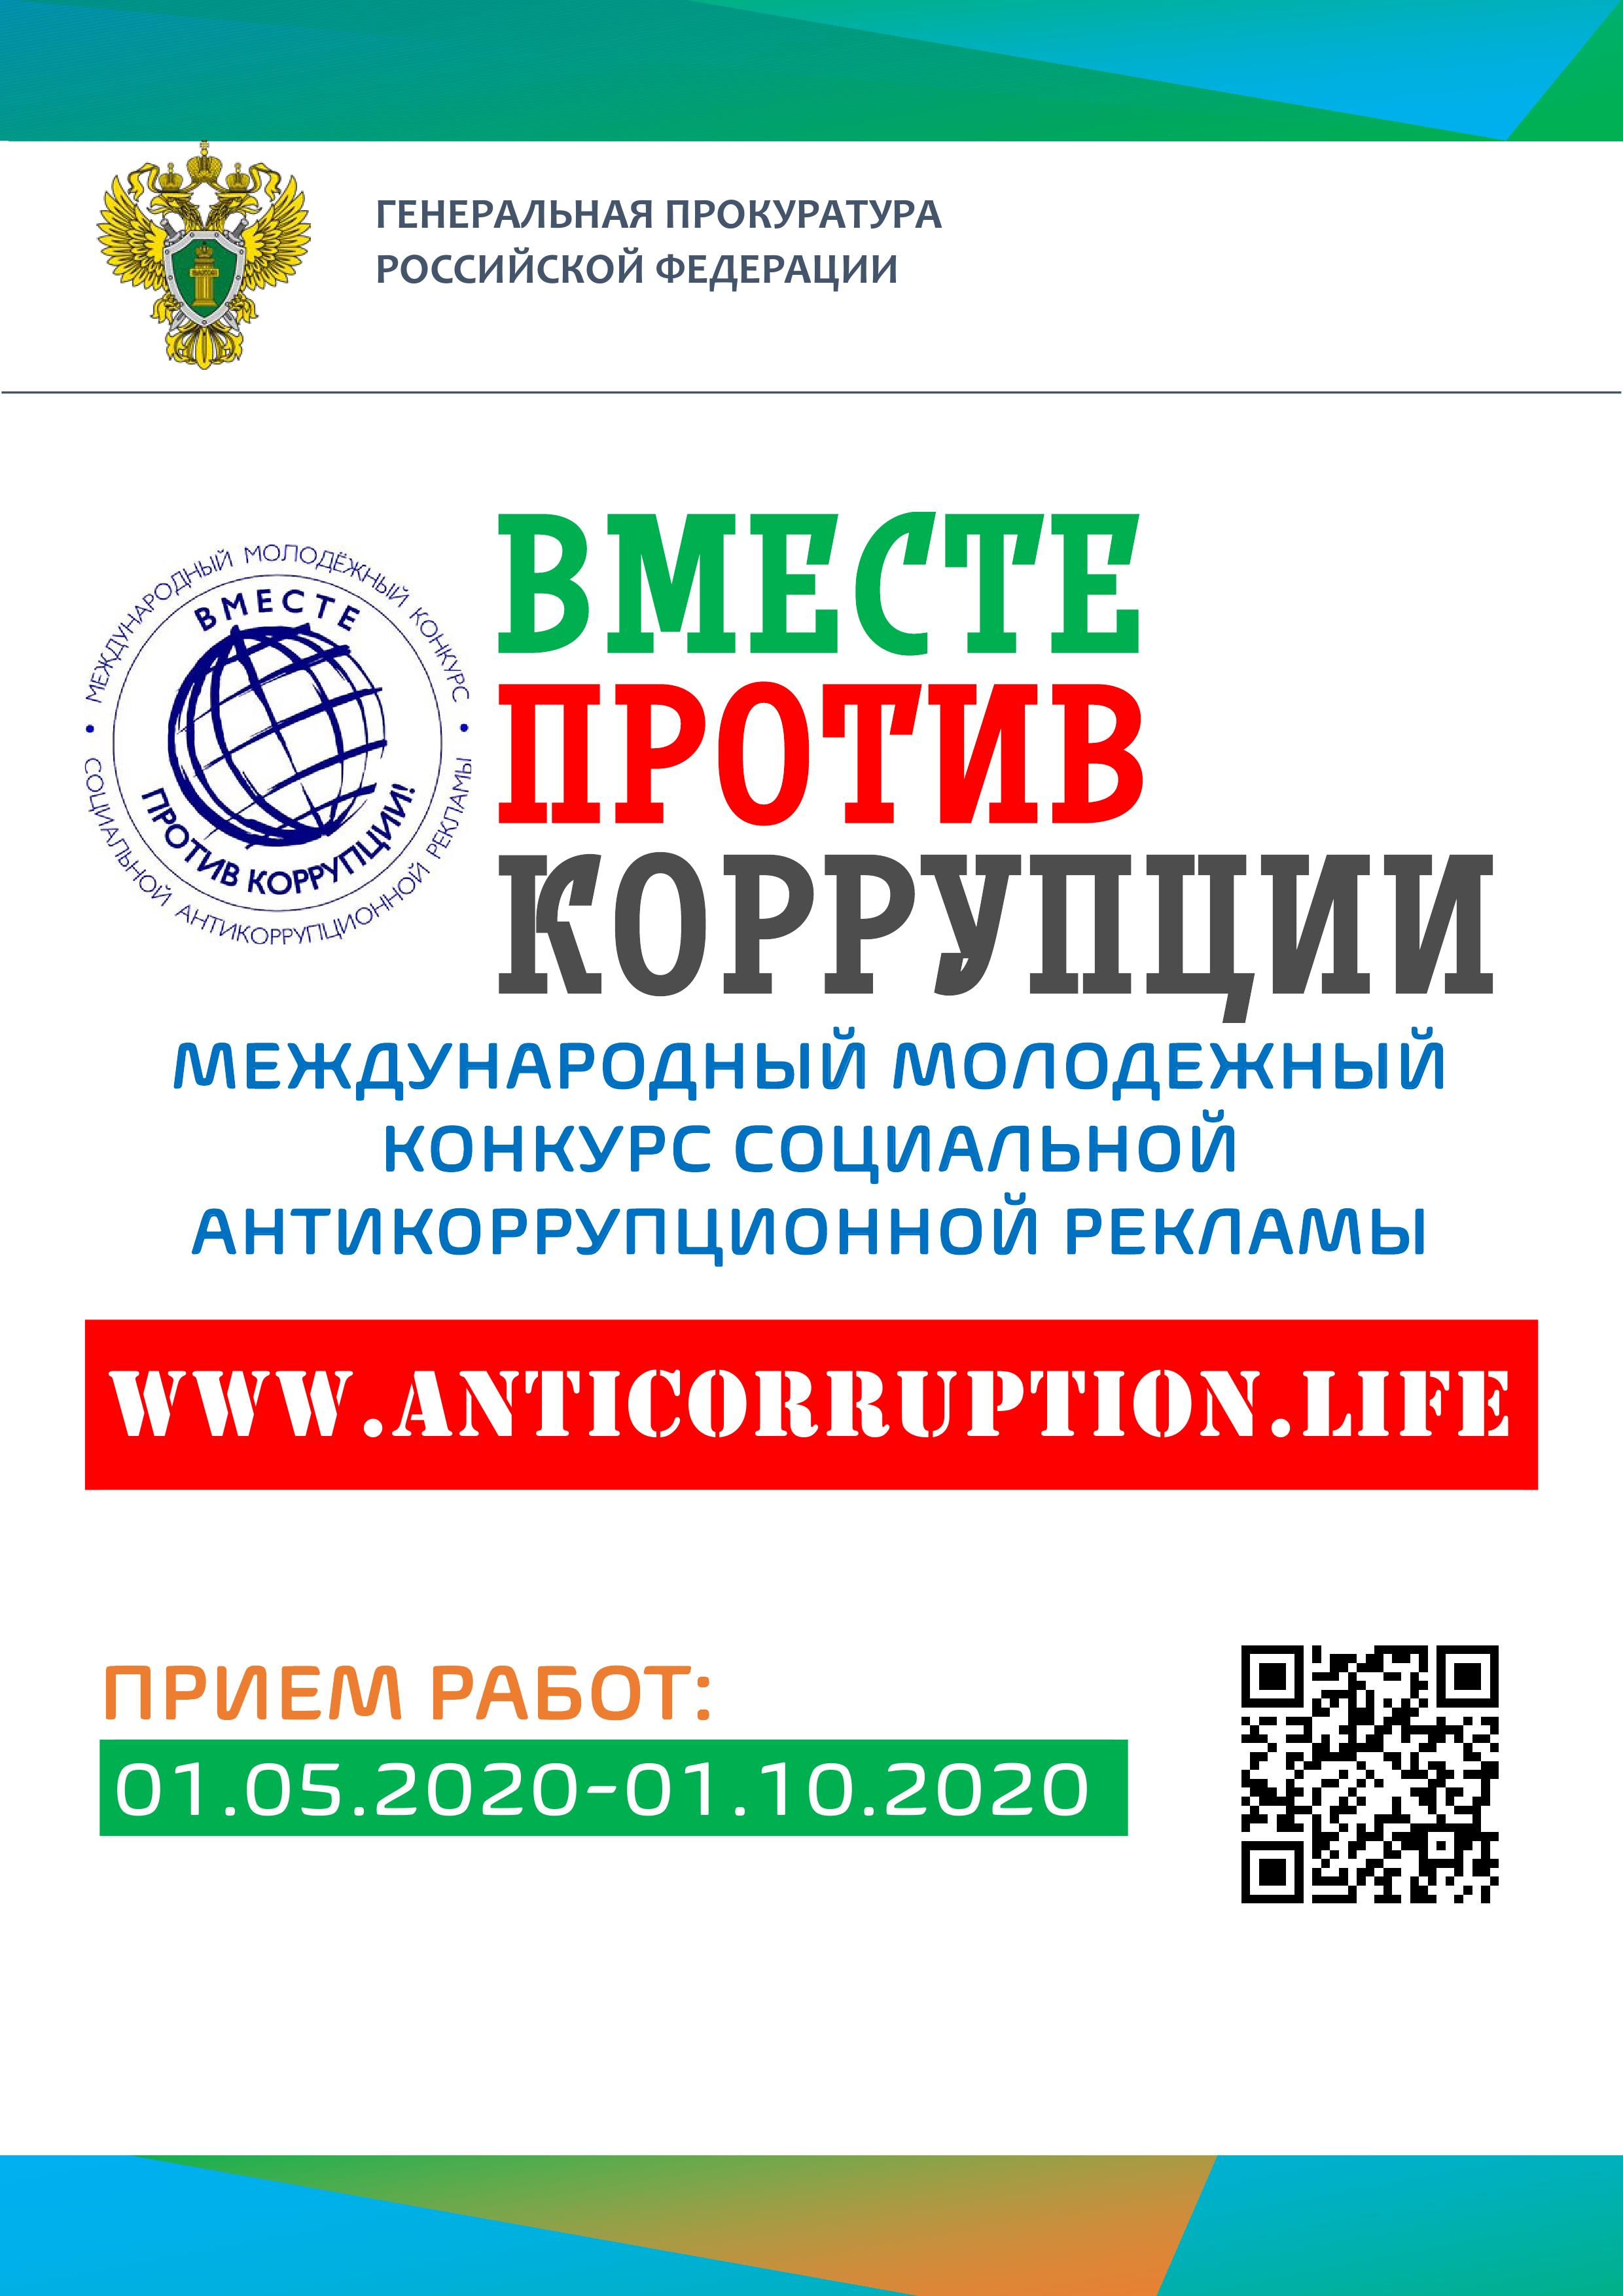 листовка международного конкурса_000